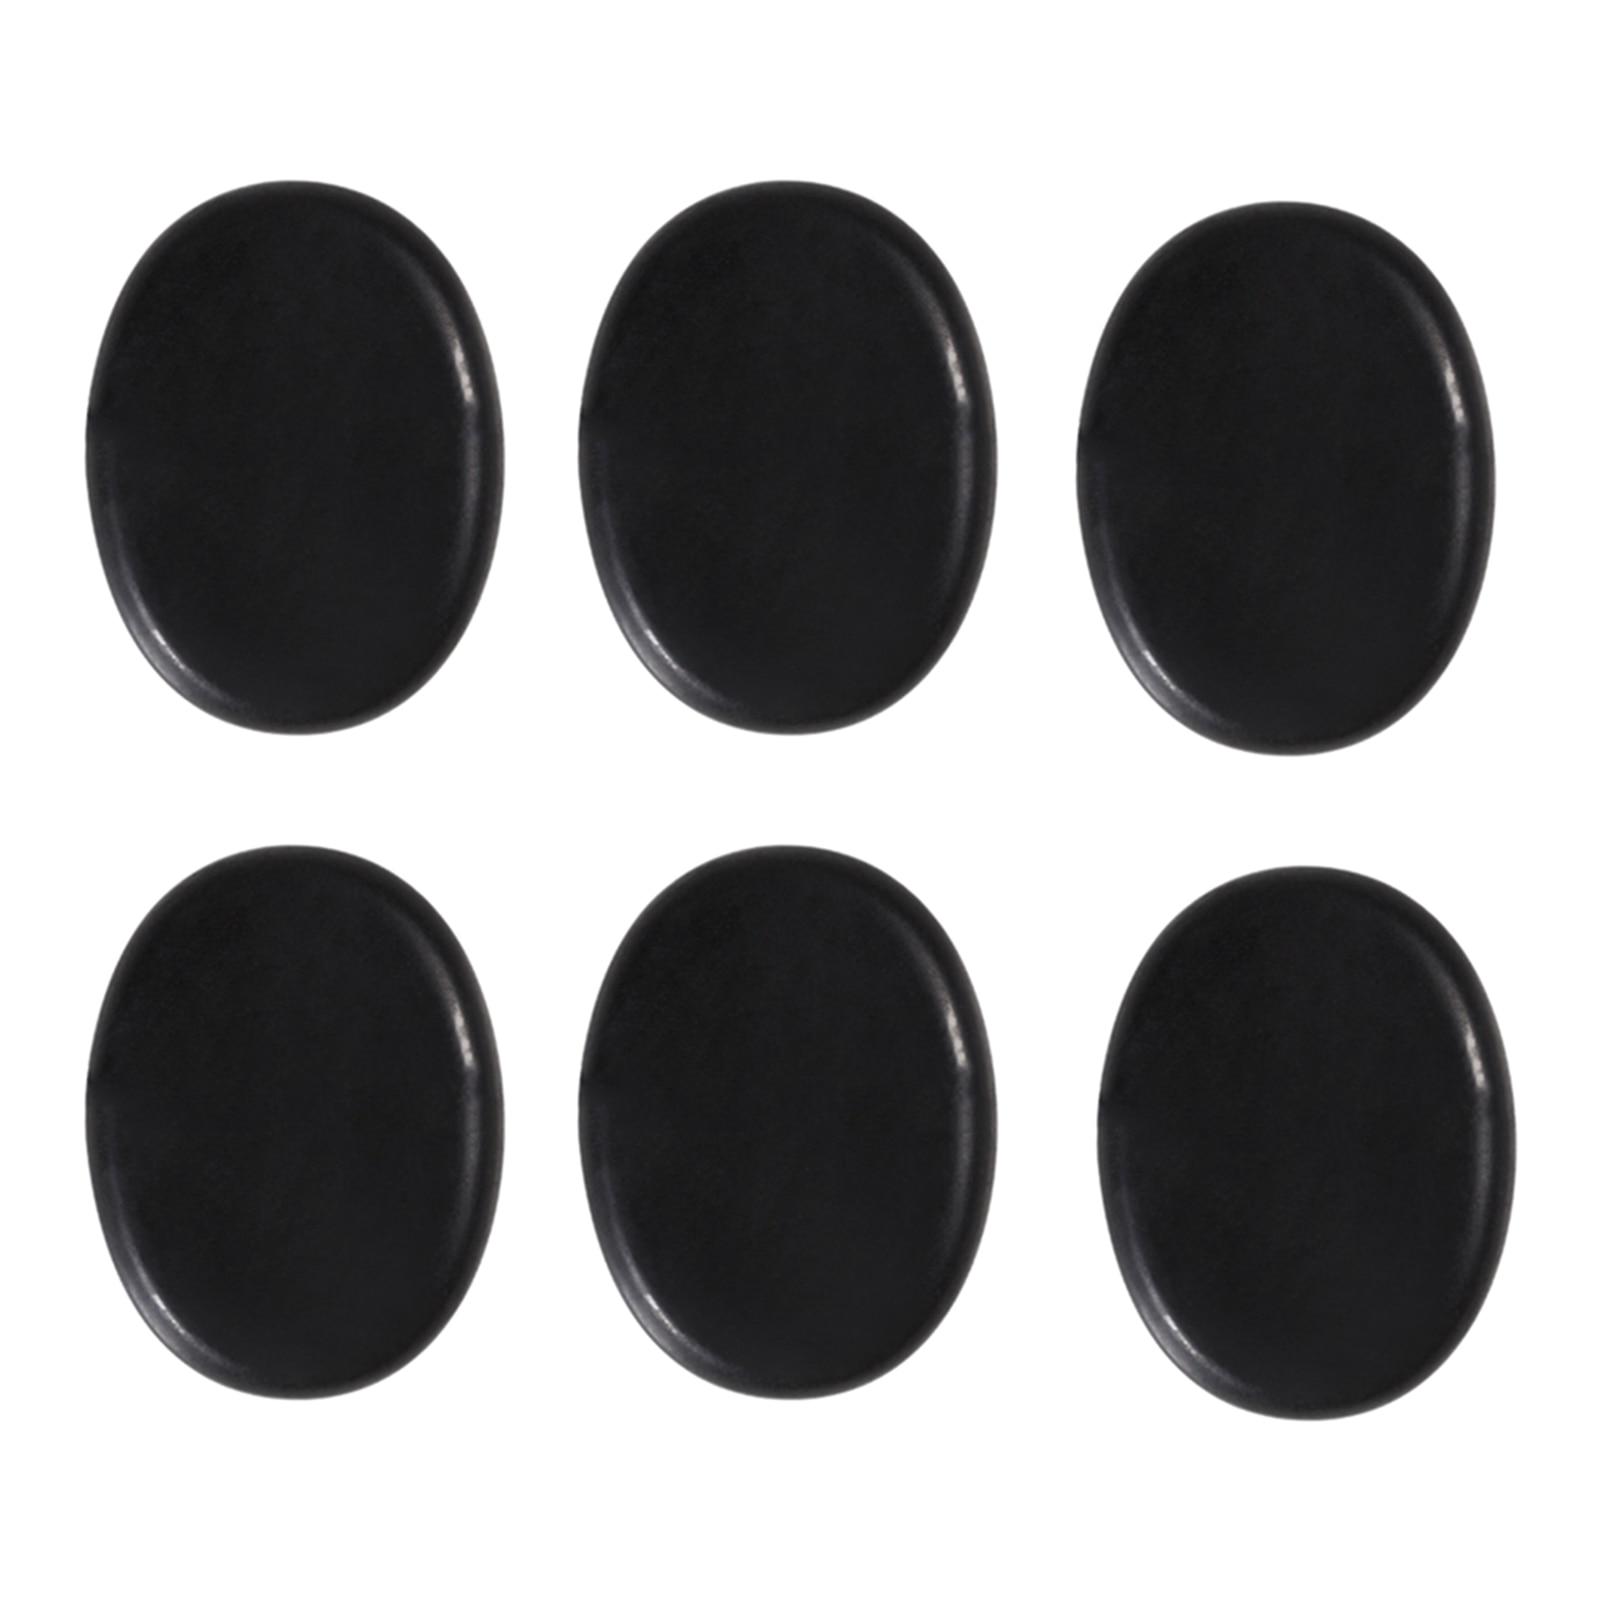 6 Pcs Hot Massage Stone Set Natural Basalt Warmer Rock Kit 4 X 3cm Easy To Repair